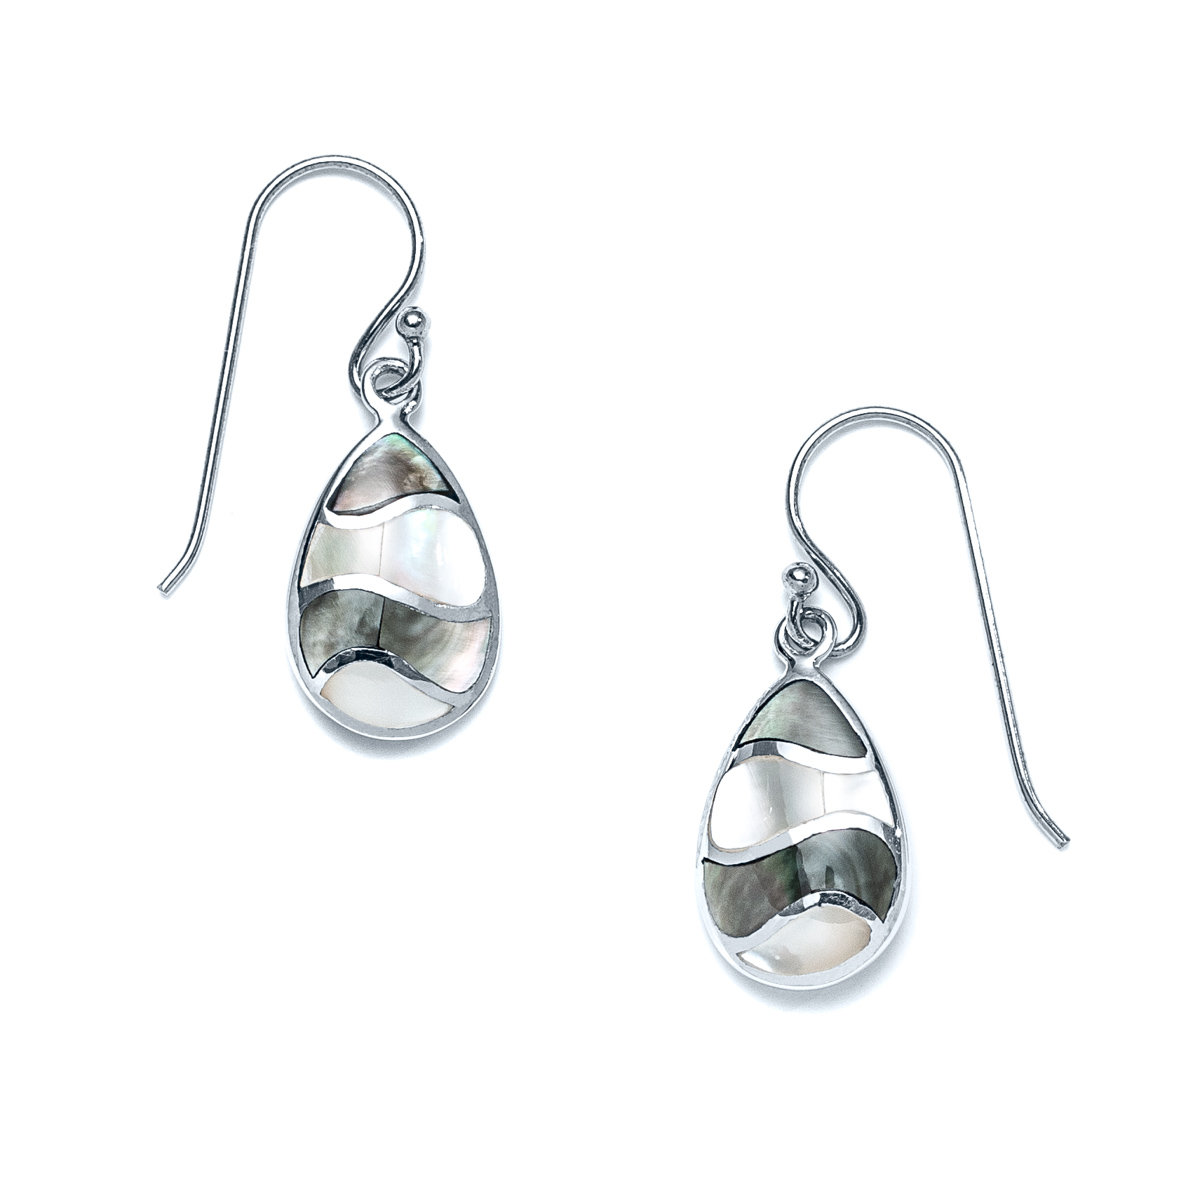 Duality Ocean Drop Earrings in Sterling Silver- Landing